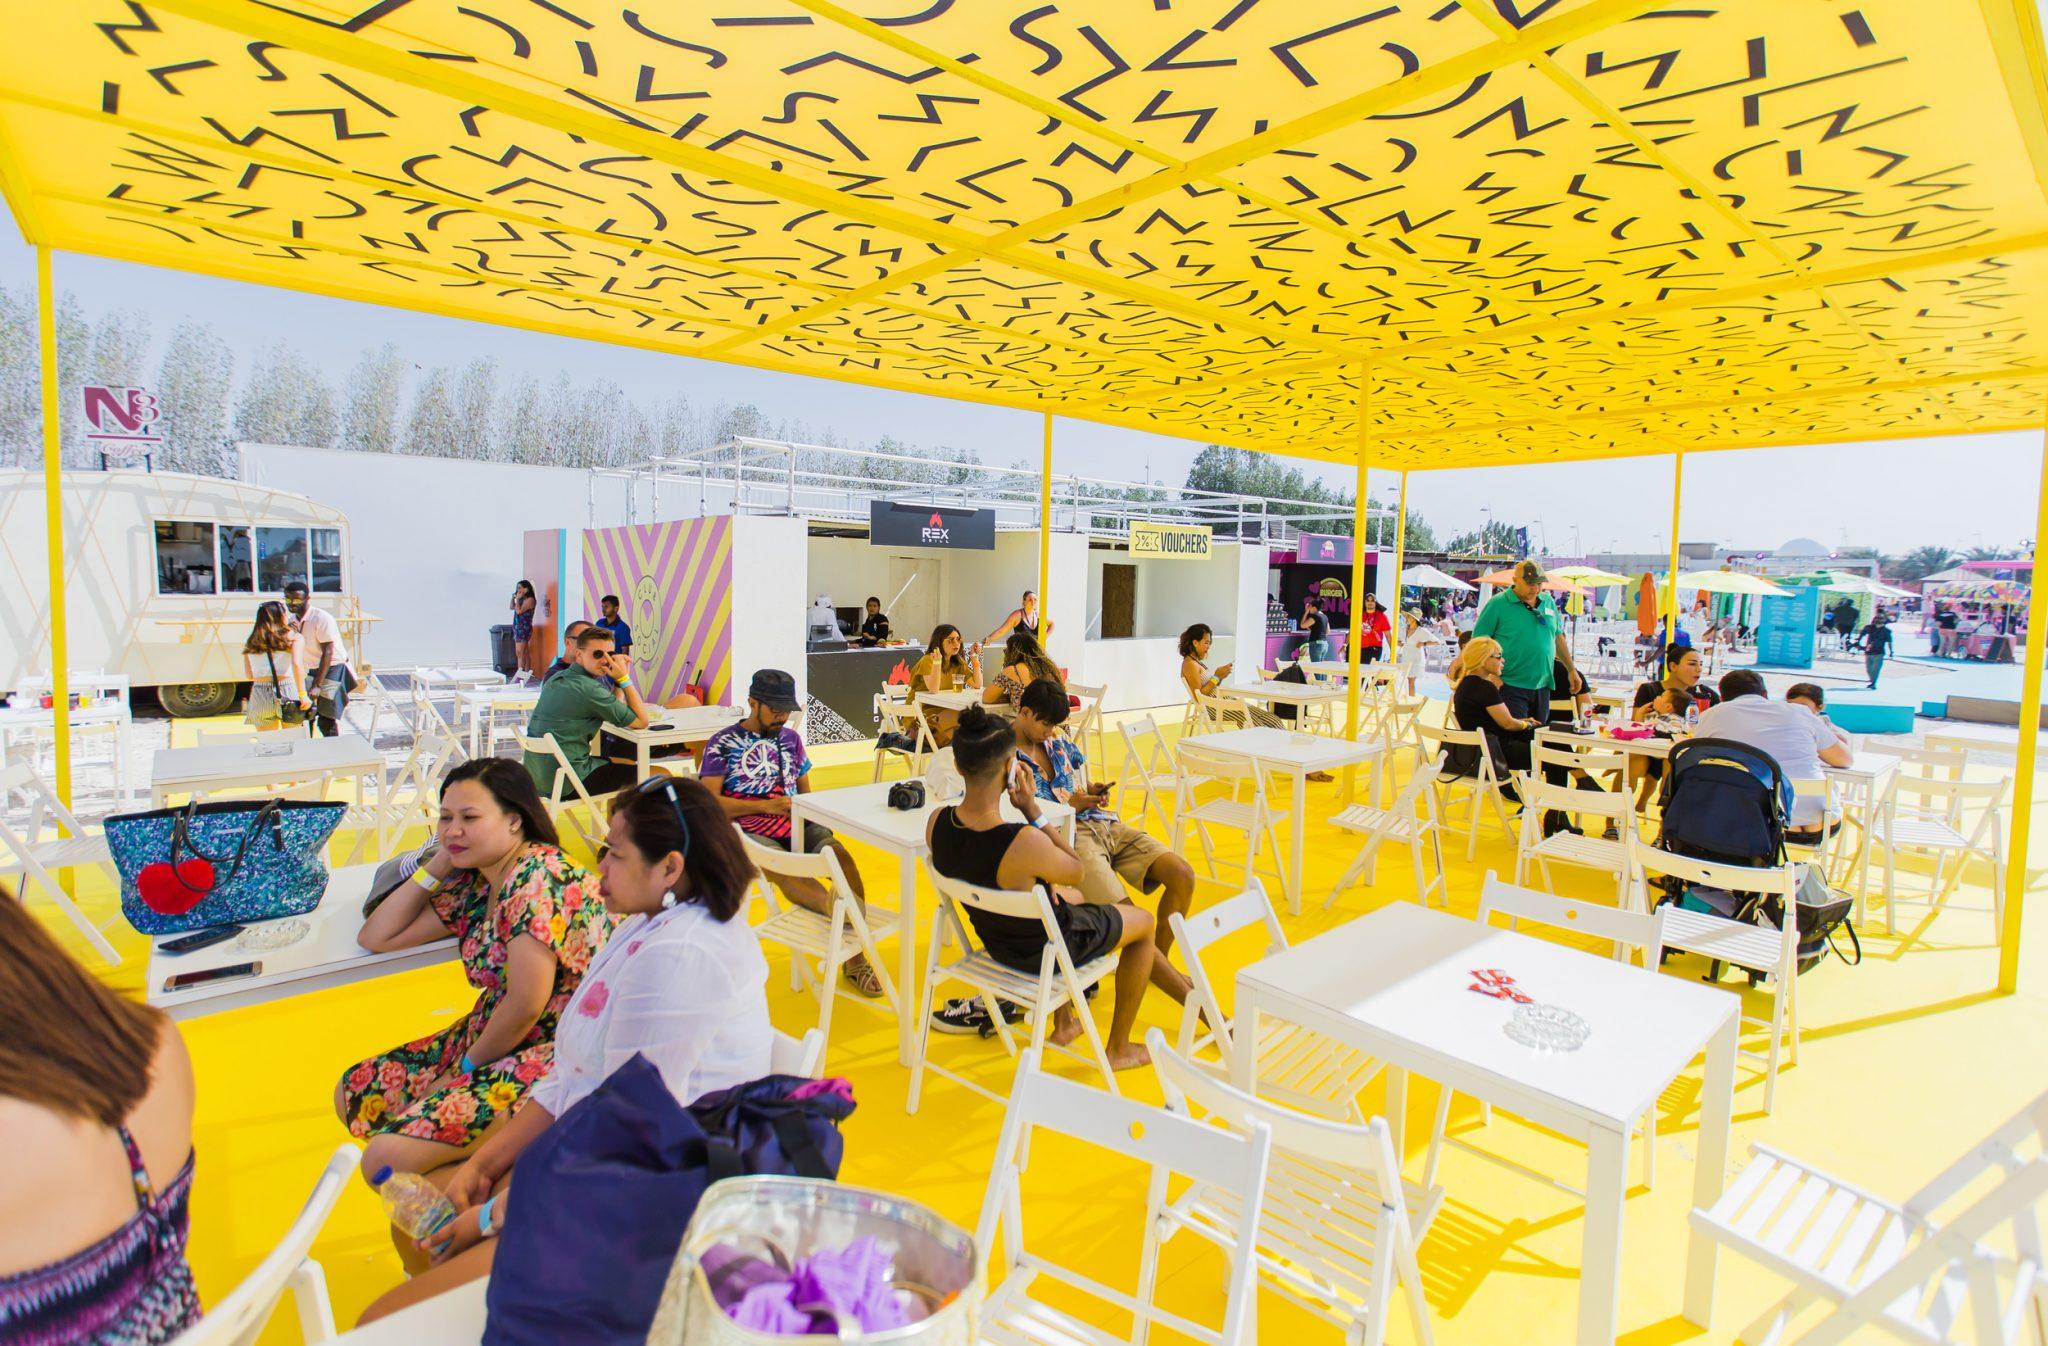 مهرجان كلوب سوشيال 2020